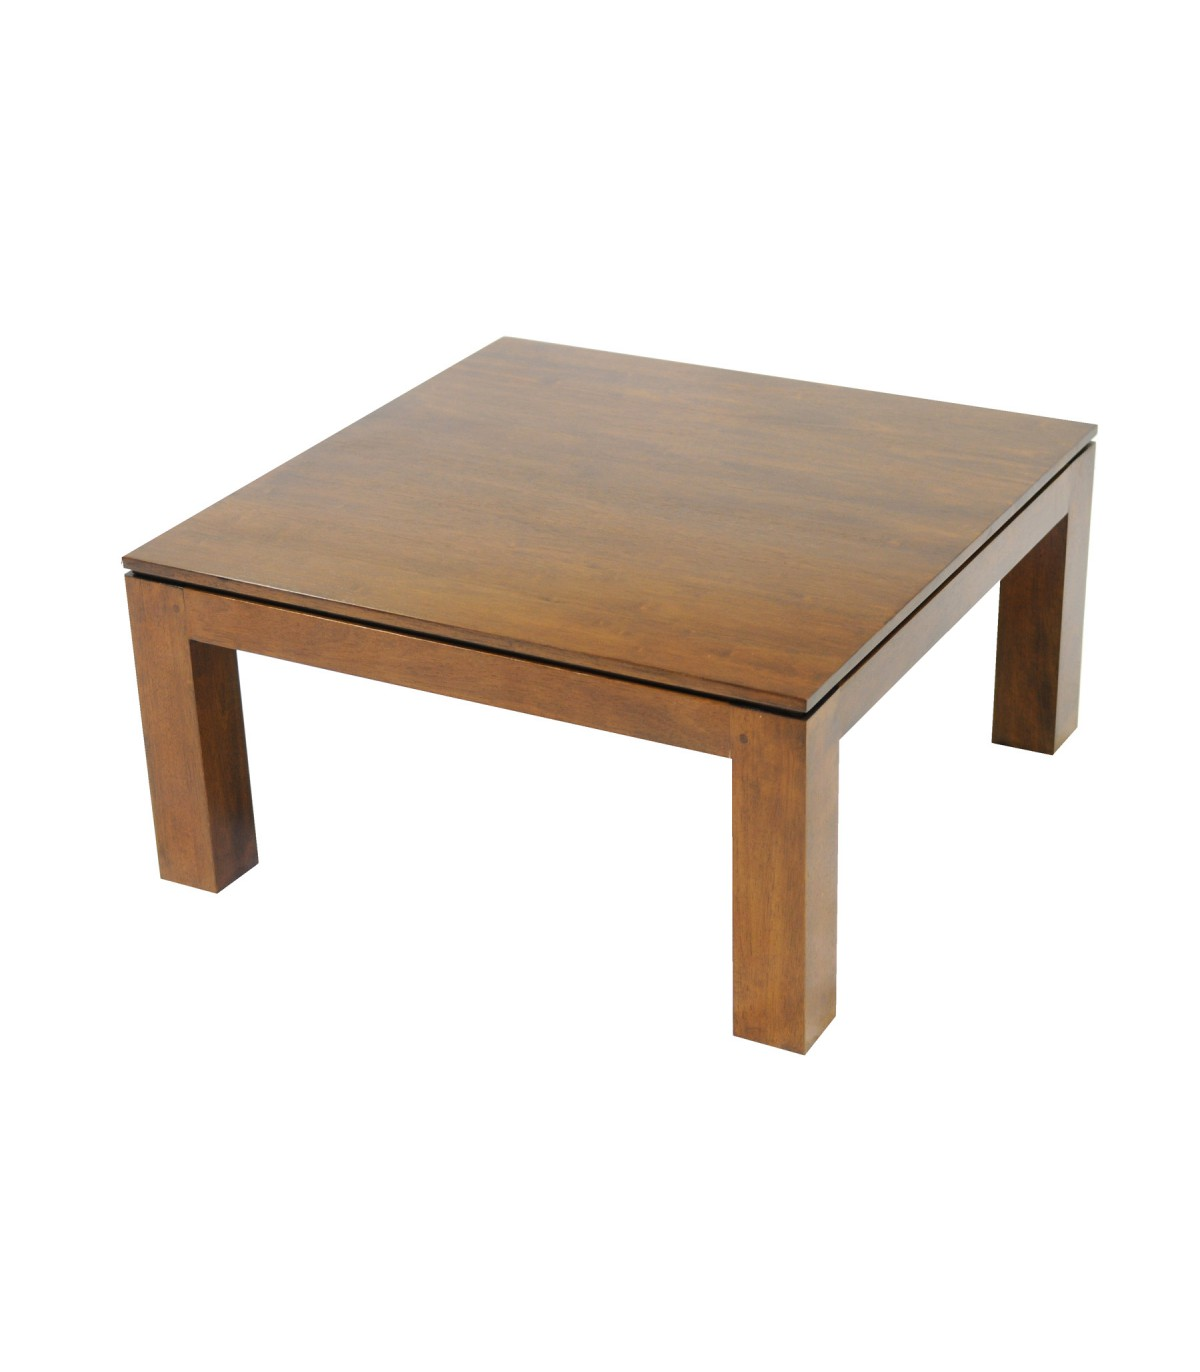 Basse Table En Carrée Hévéa Huilé IeW2EDHY9